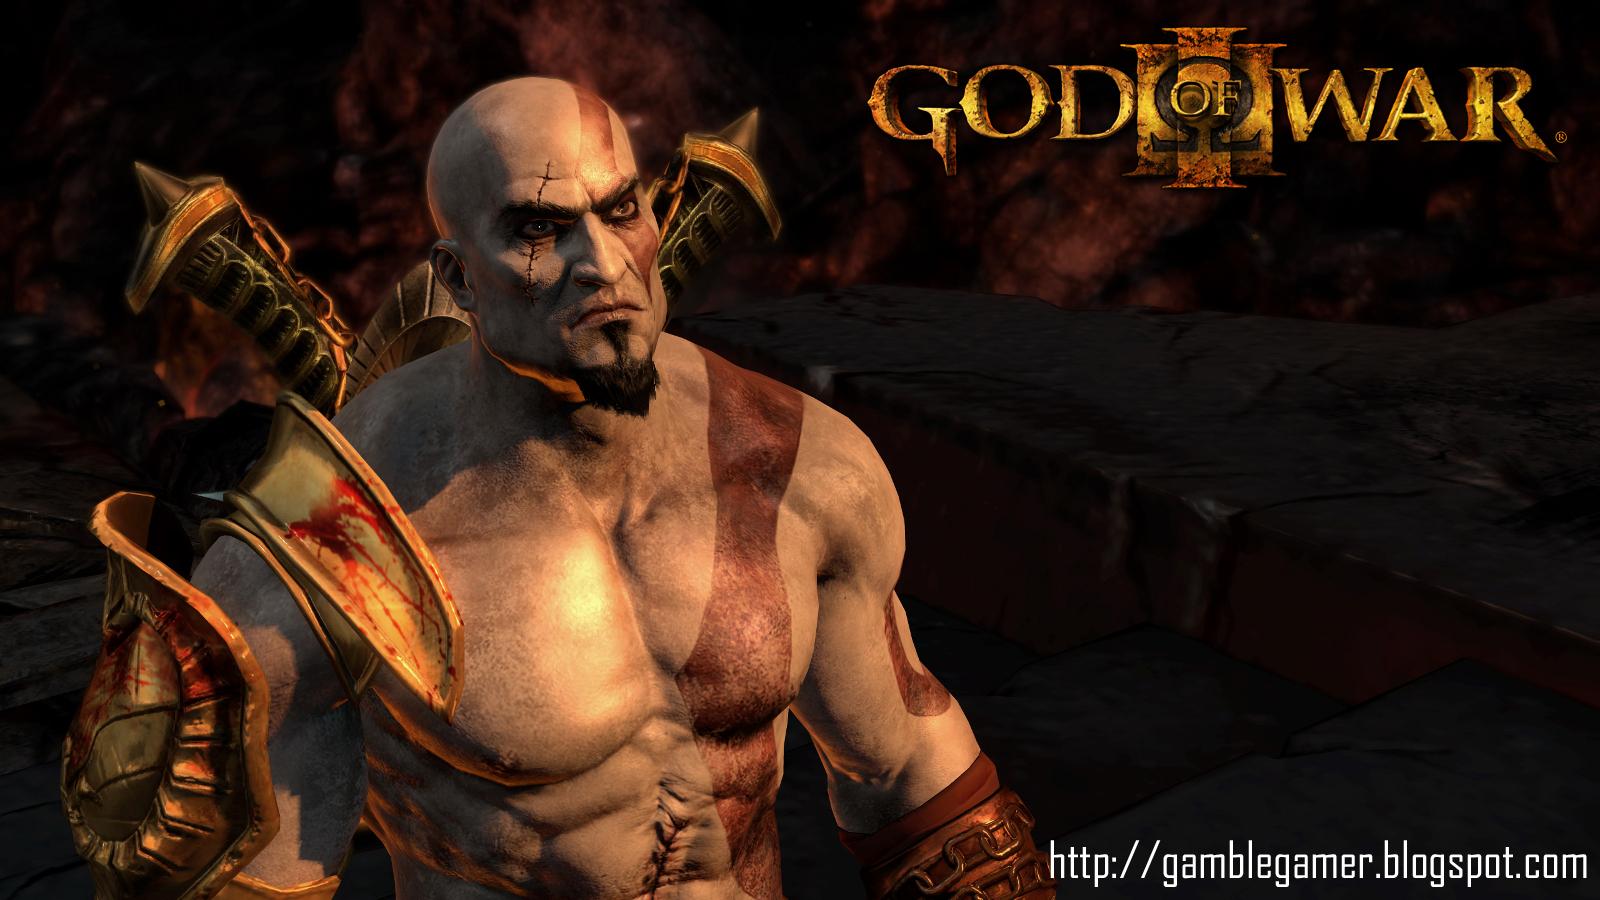 Playstation 3 The Best - Página 3 God-of-war-3-kratos+c%25C3%25B3pia